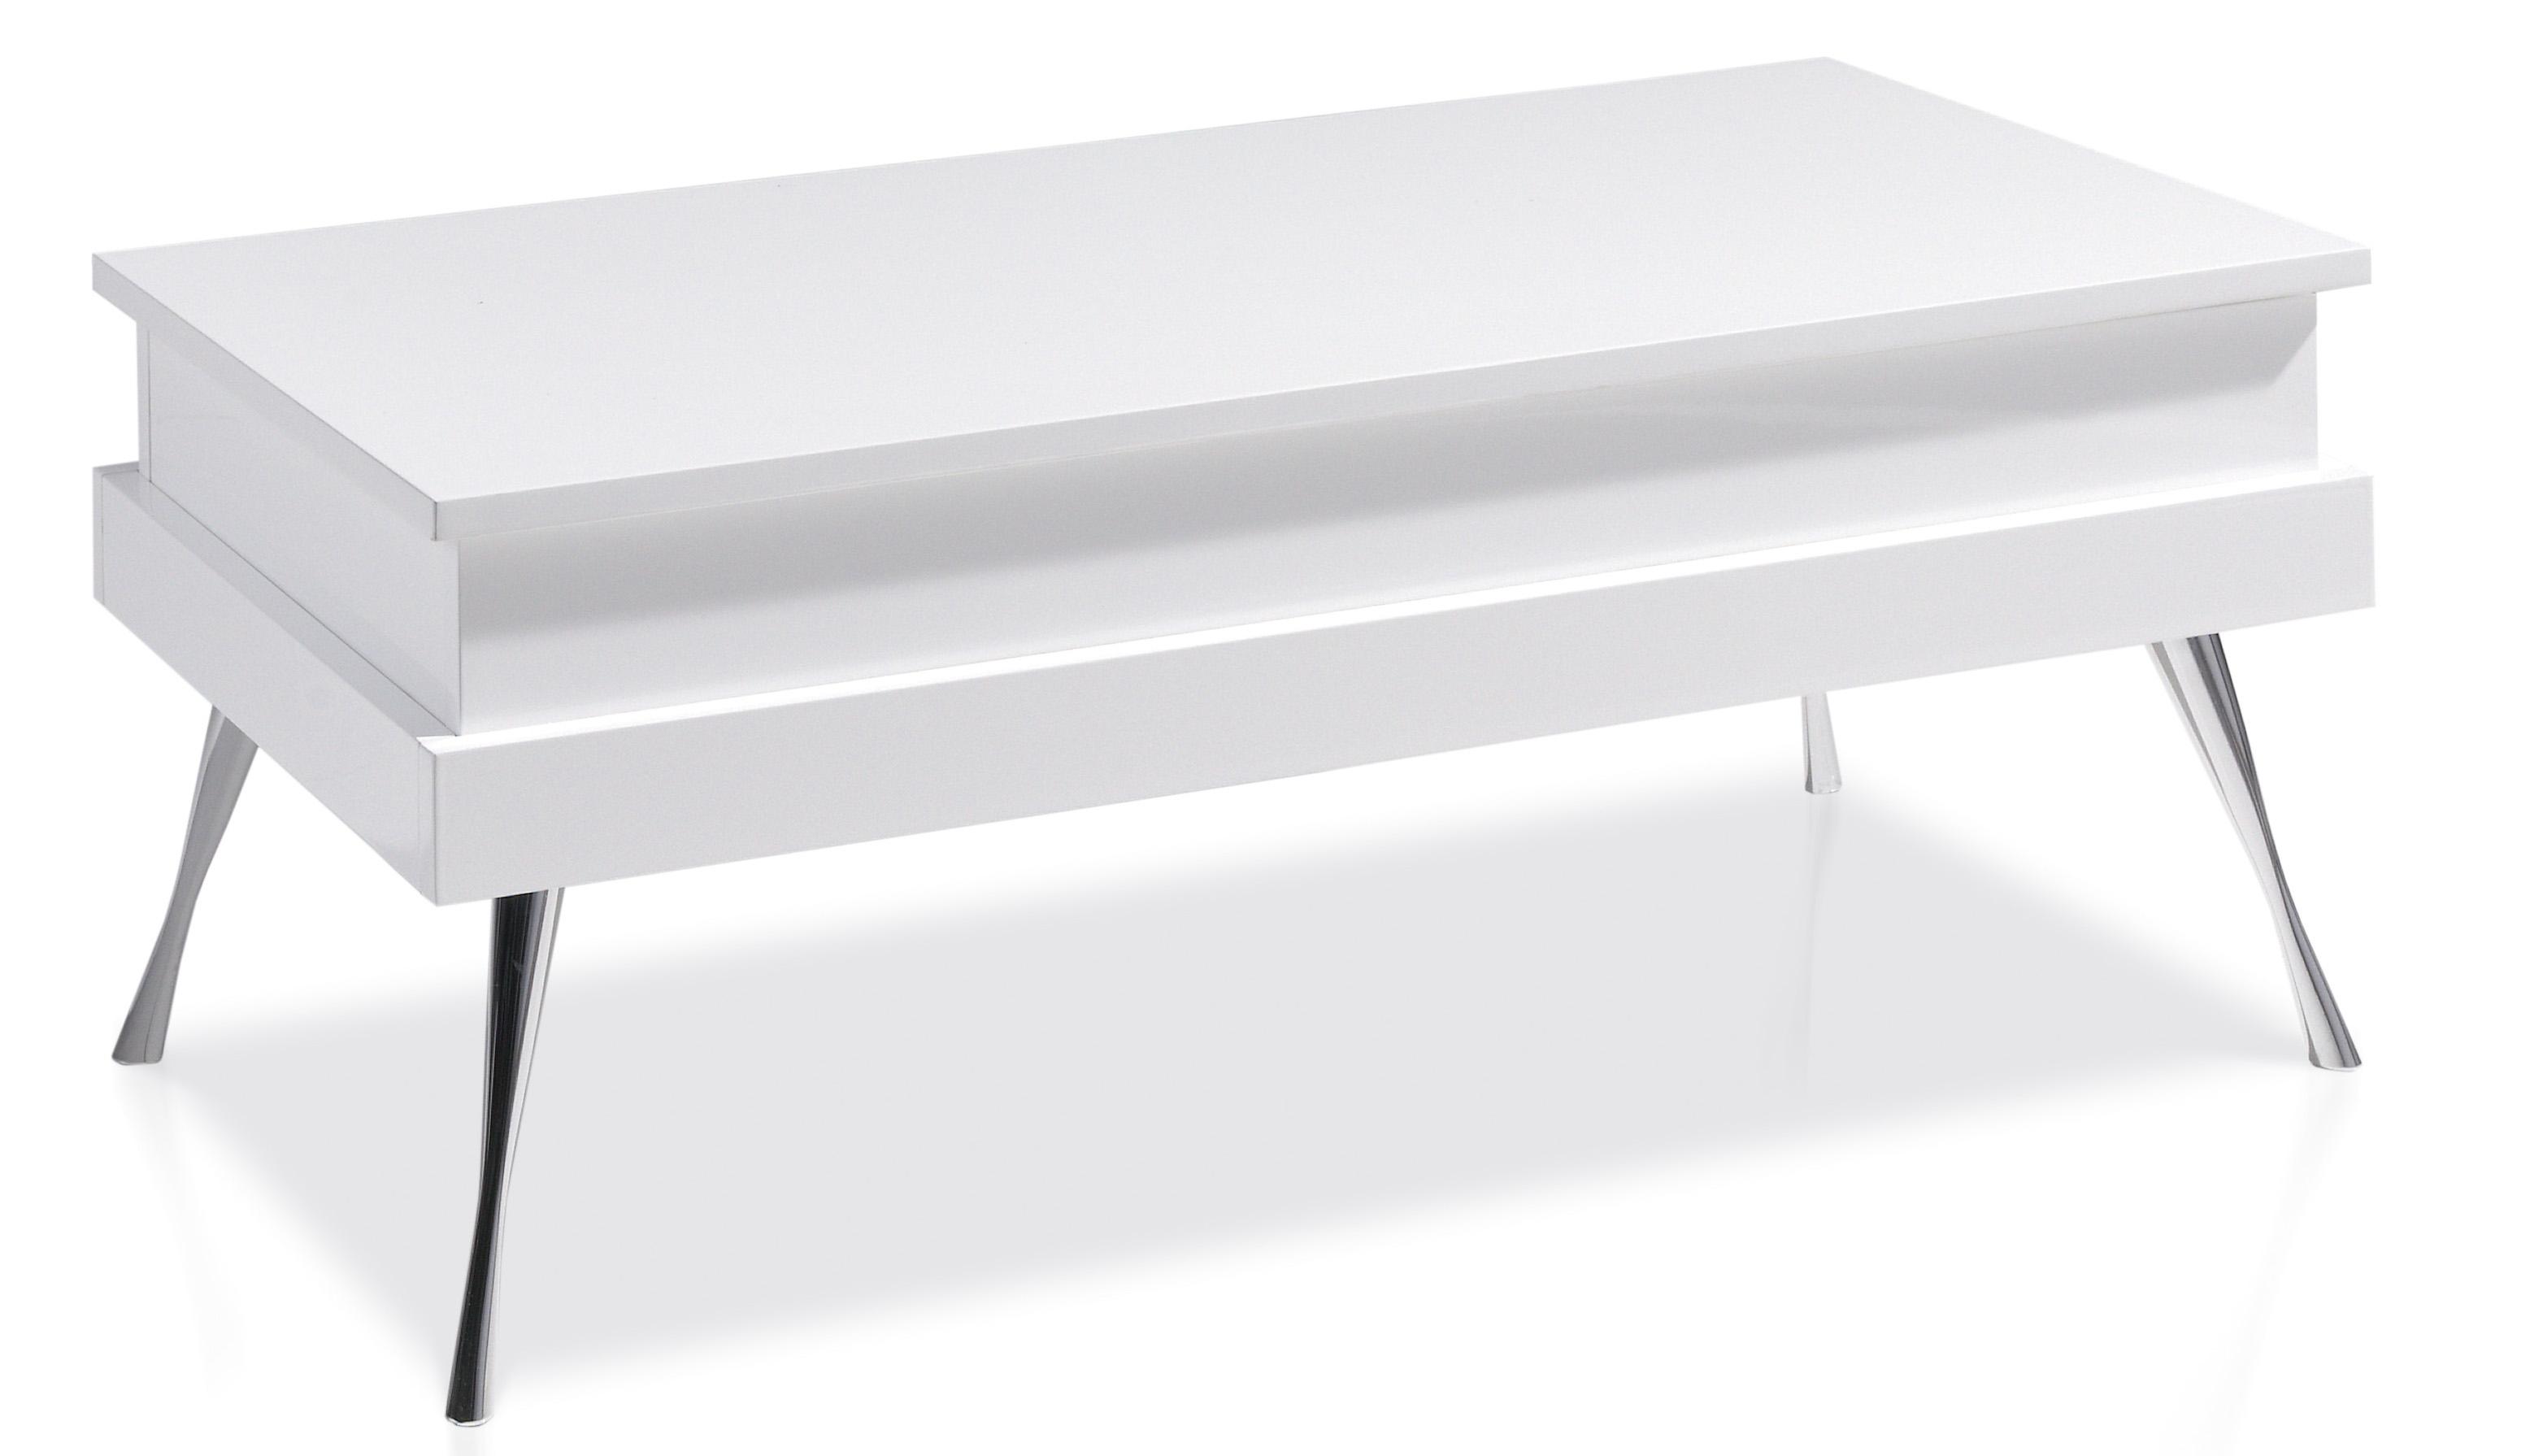 table basse relevable laqu e blanc pied acier chrom simpla. Black Bedroom Furniture Sets. Home Design Ideas